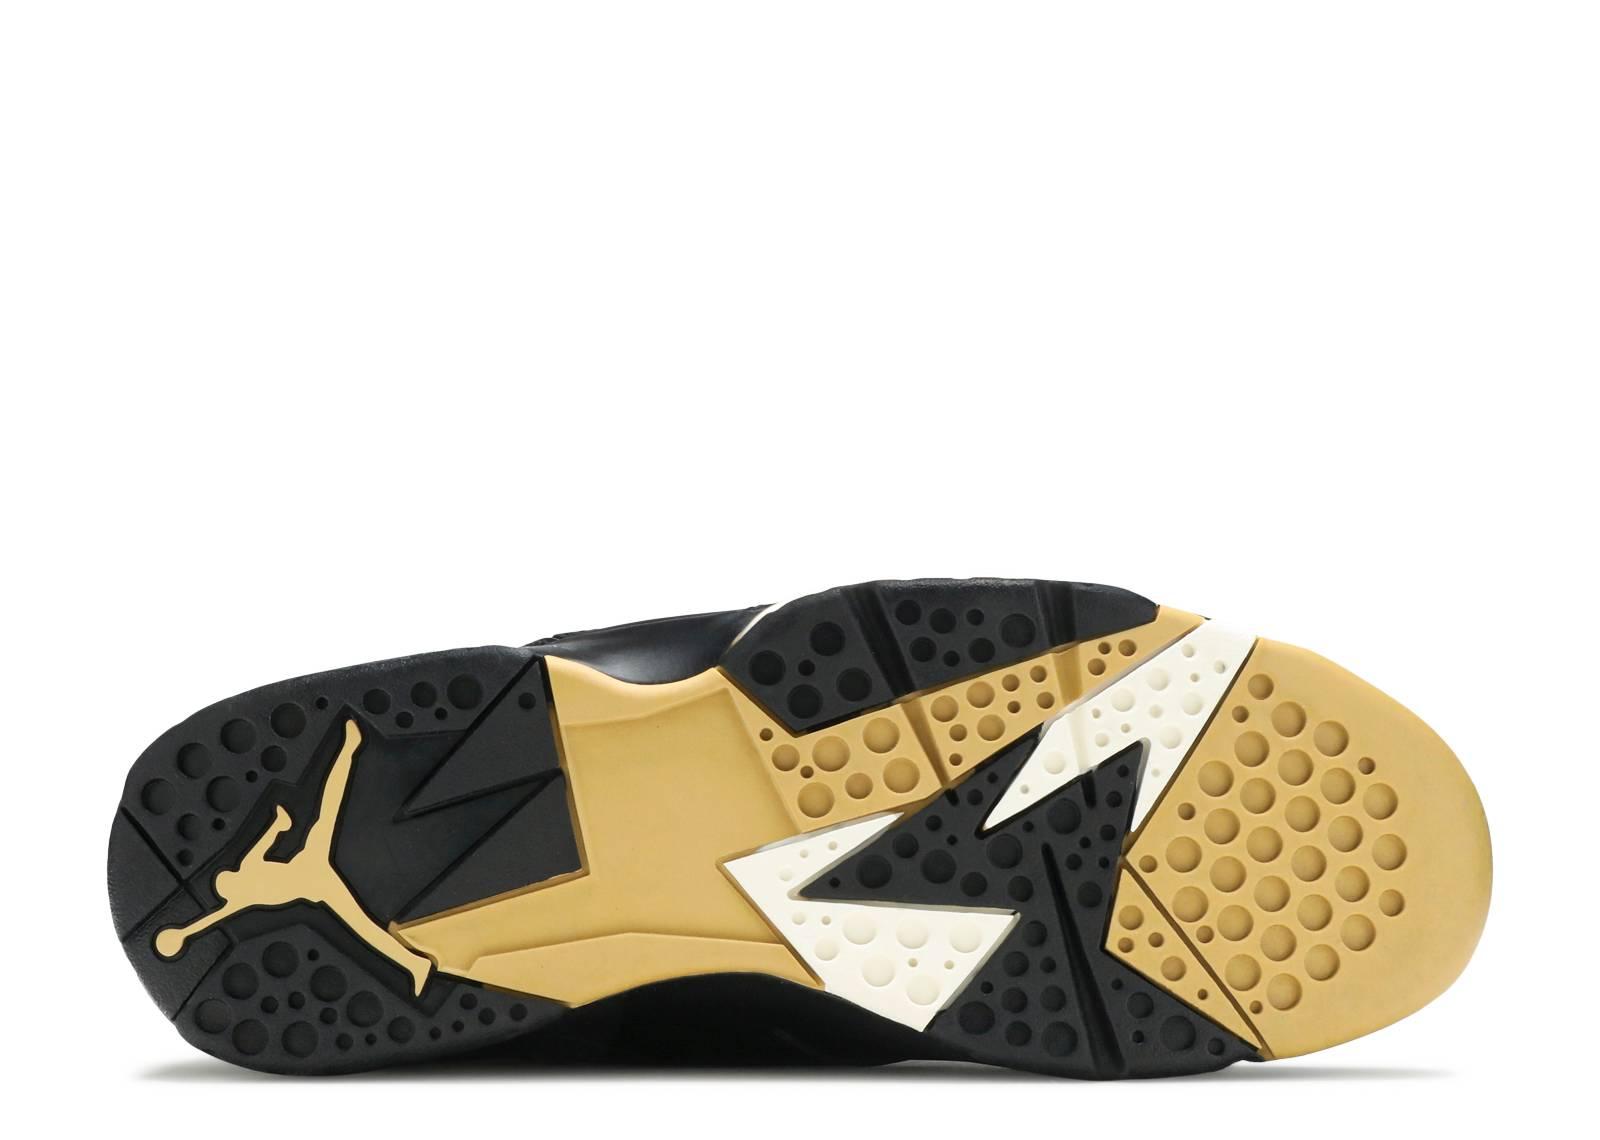 Air Jordan 3 koop